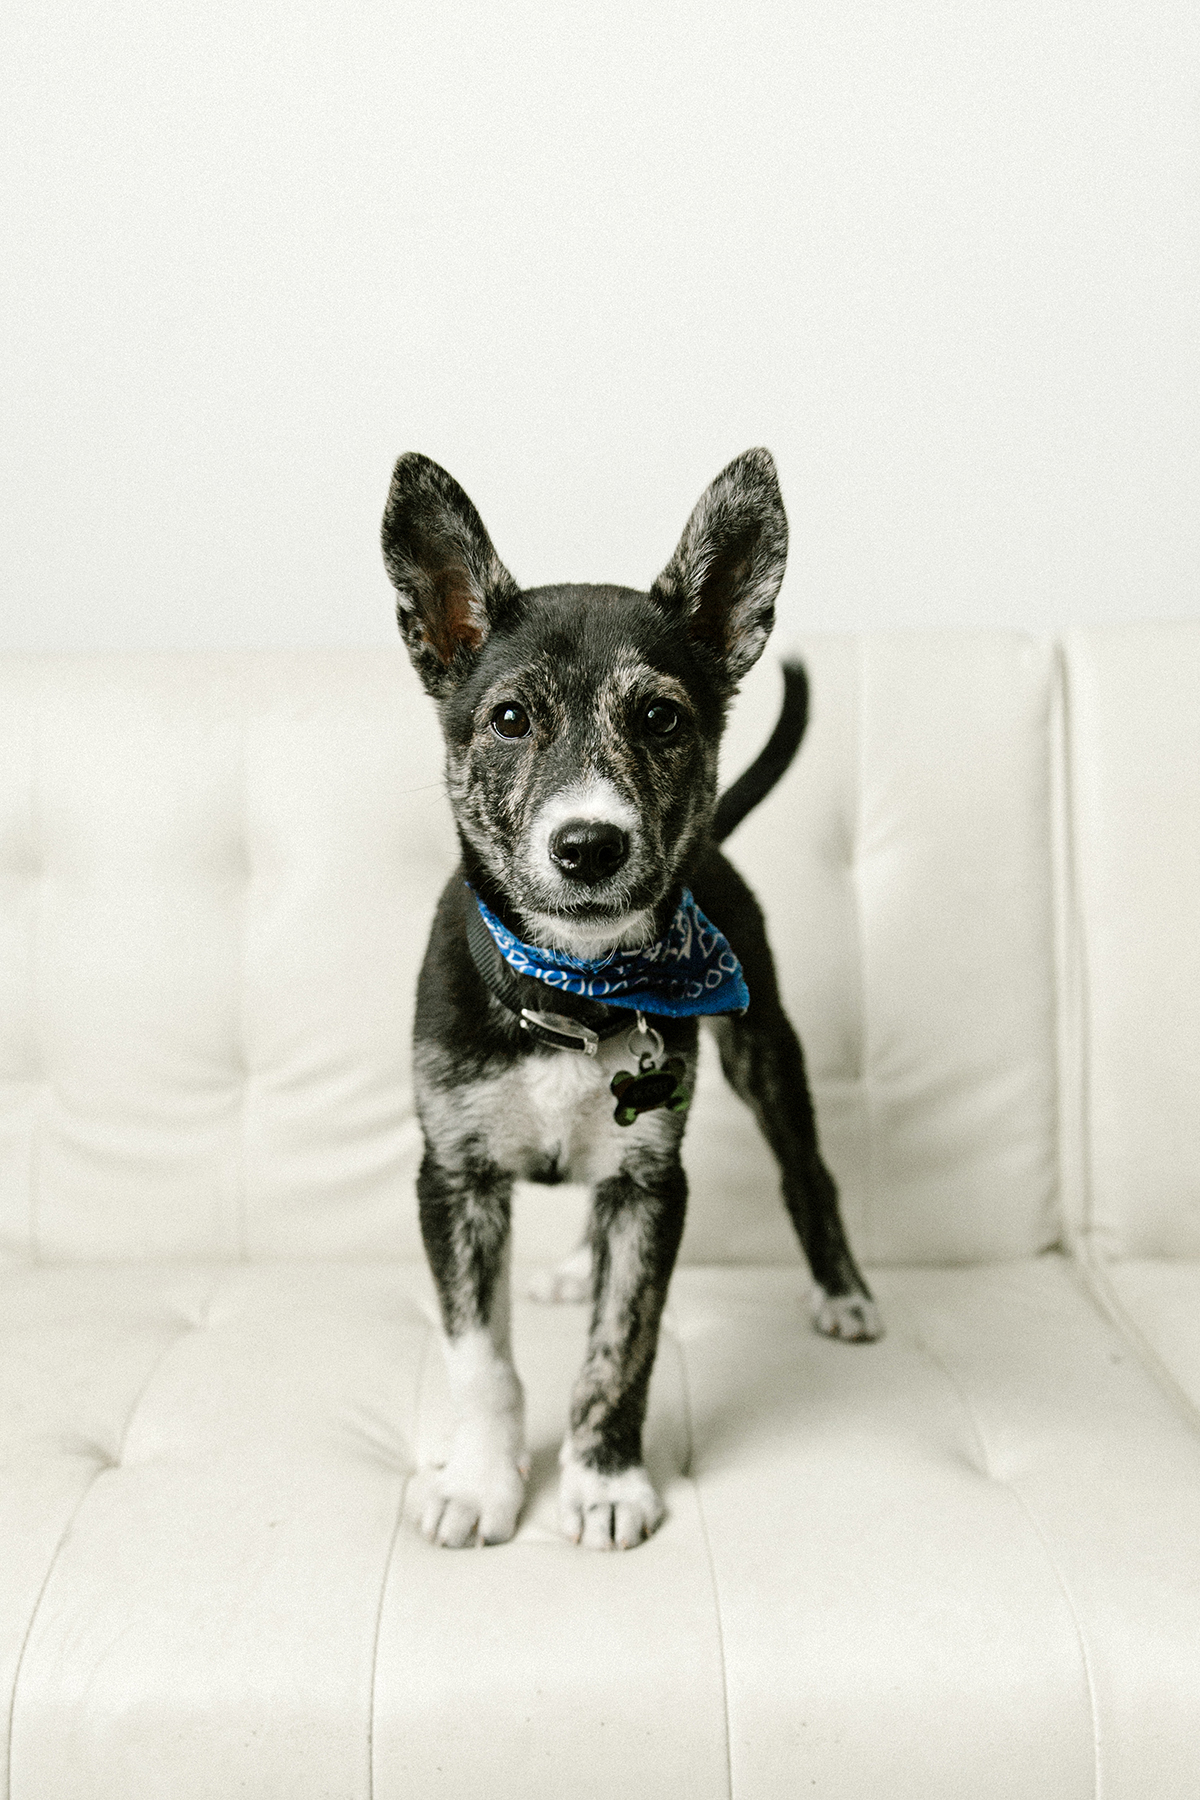 09072019-Dogs-056.jpg